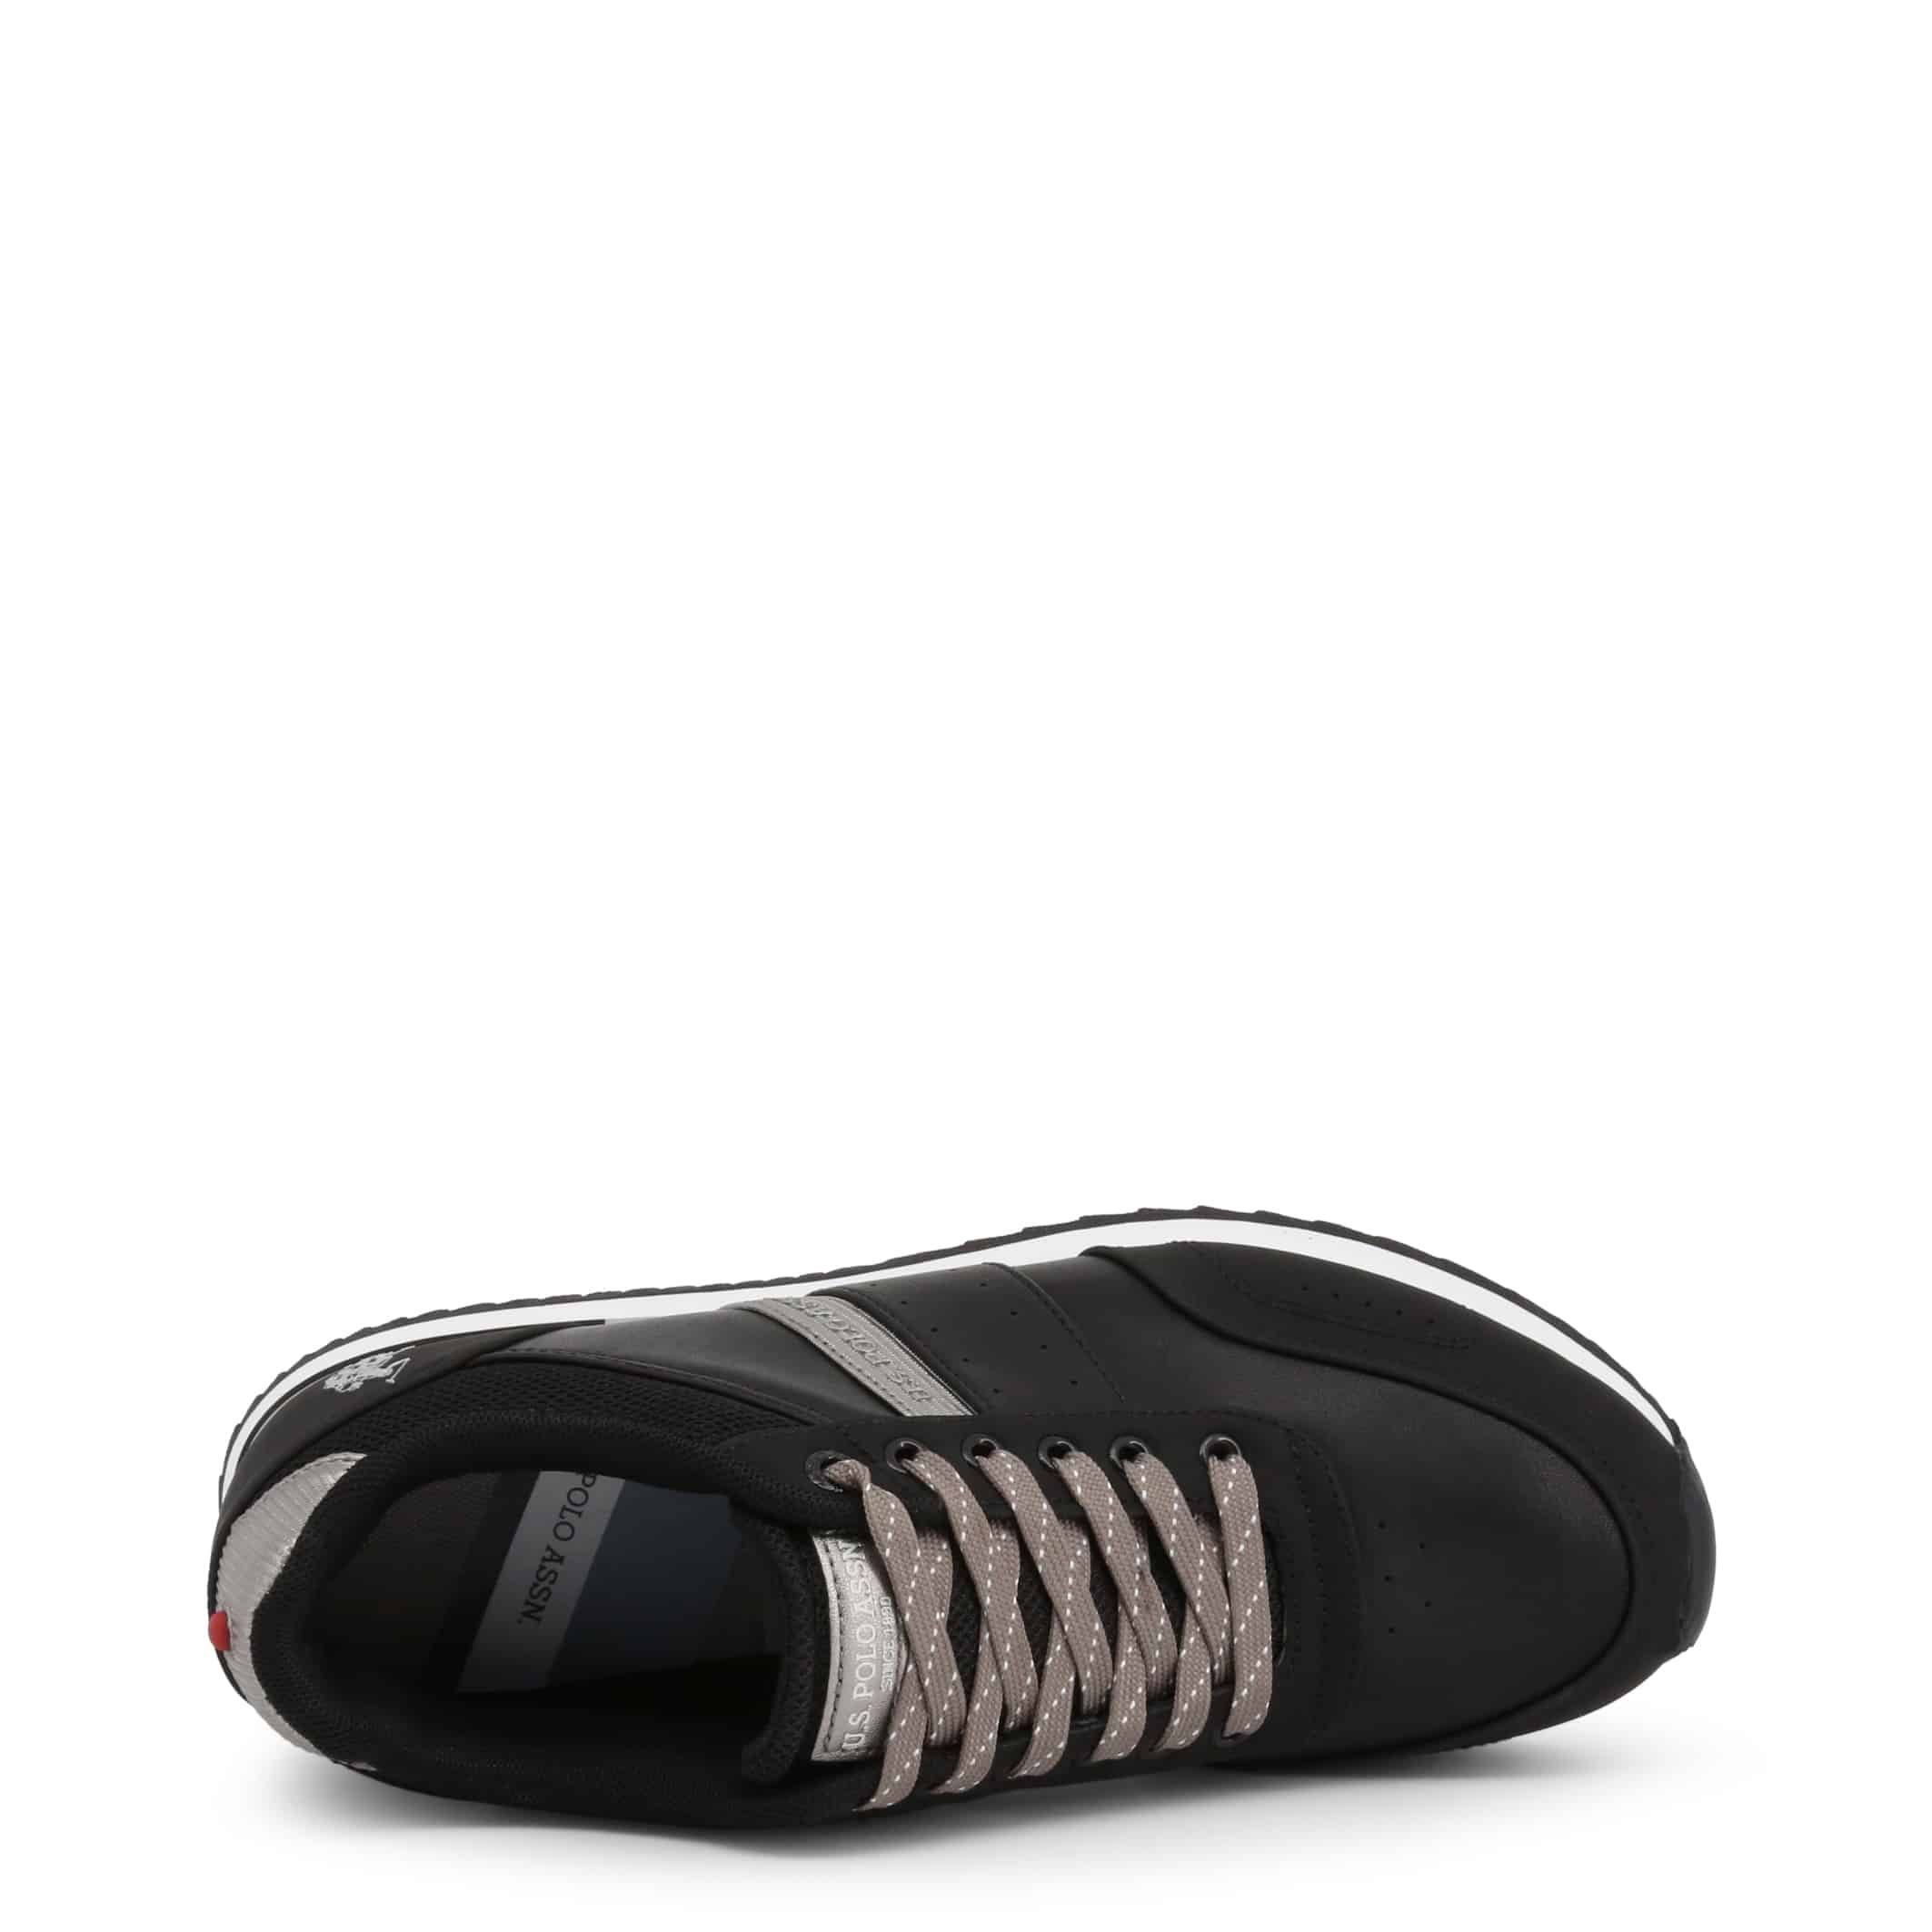 Schuhe U.S. Polo Assn. – XIRIO4121S0_YM1 – Schwarz